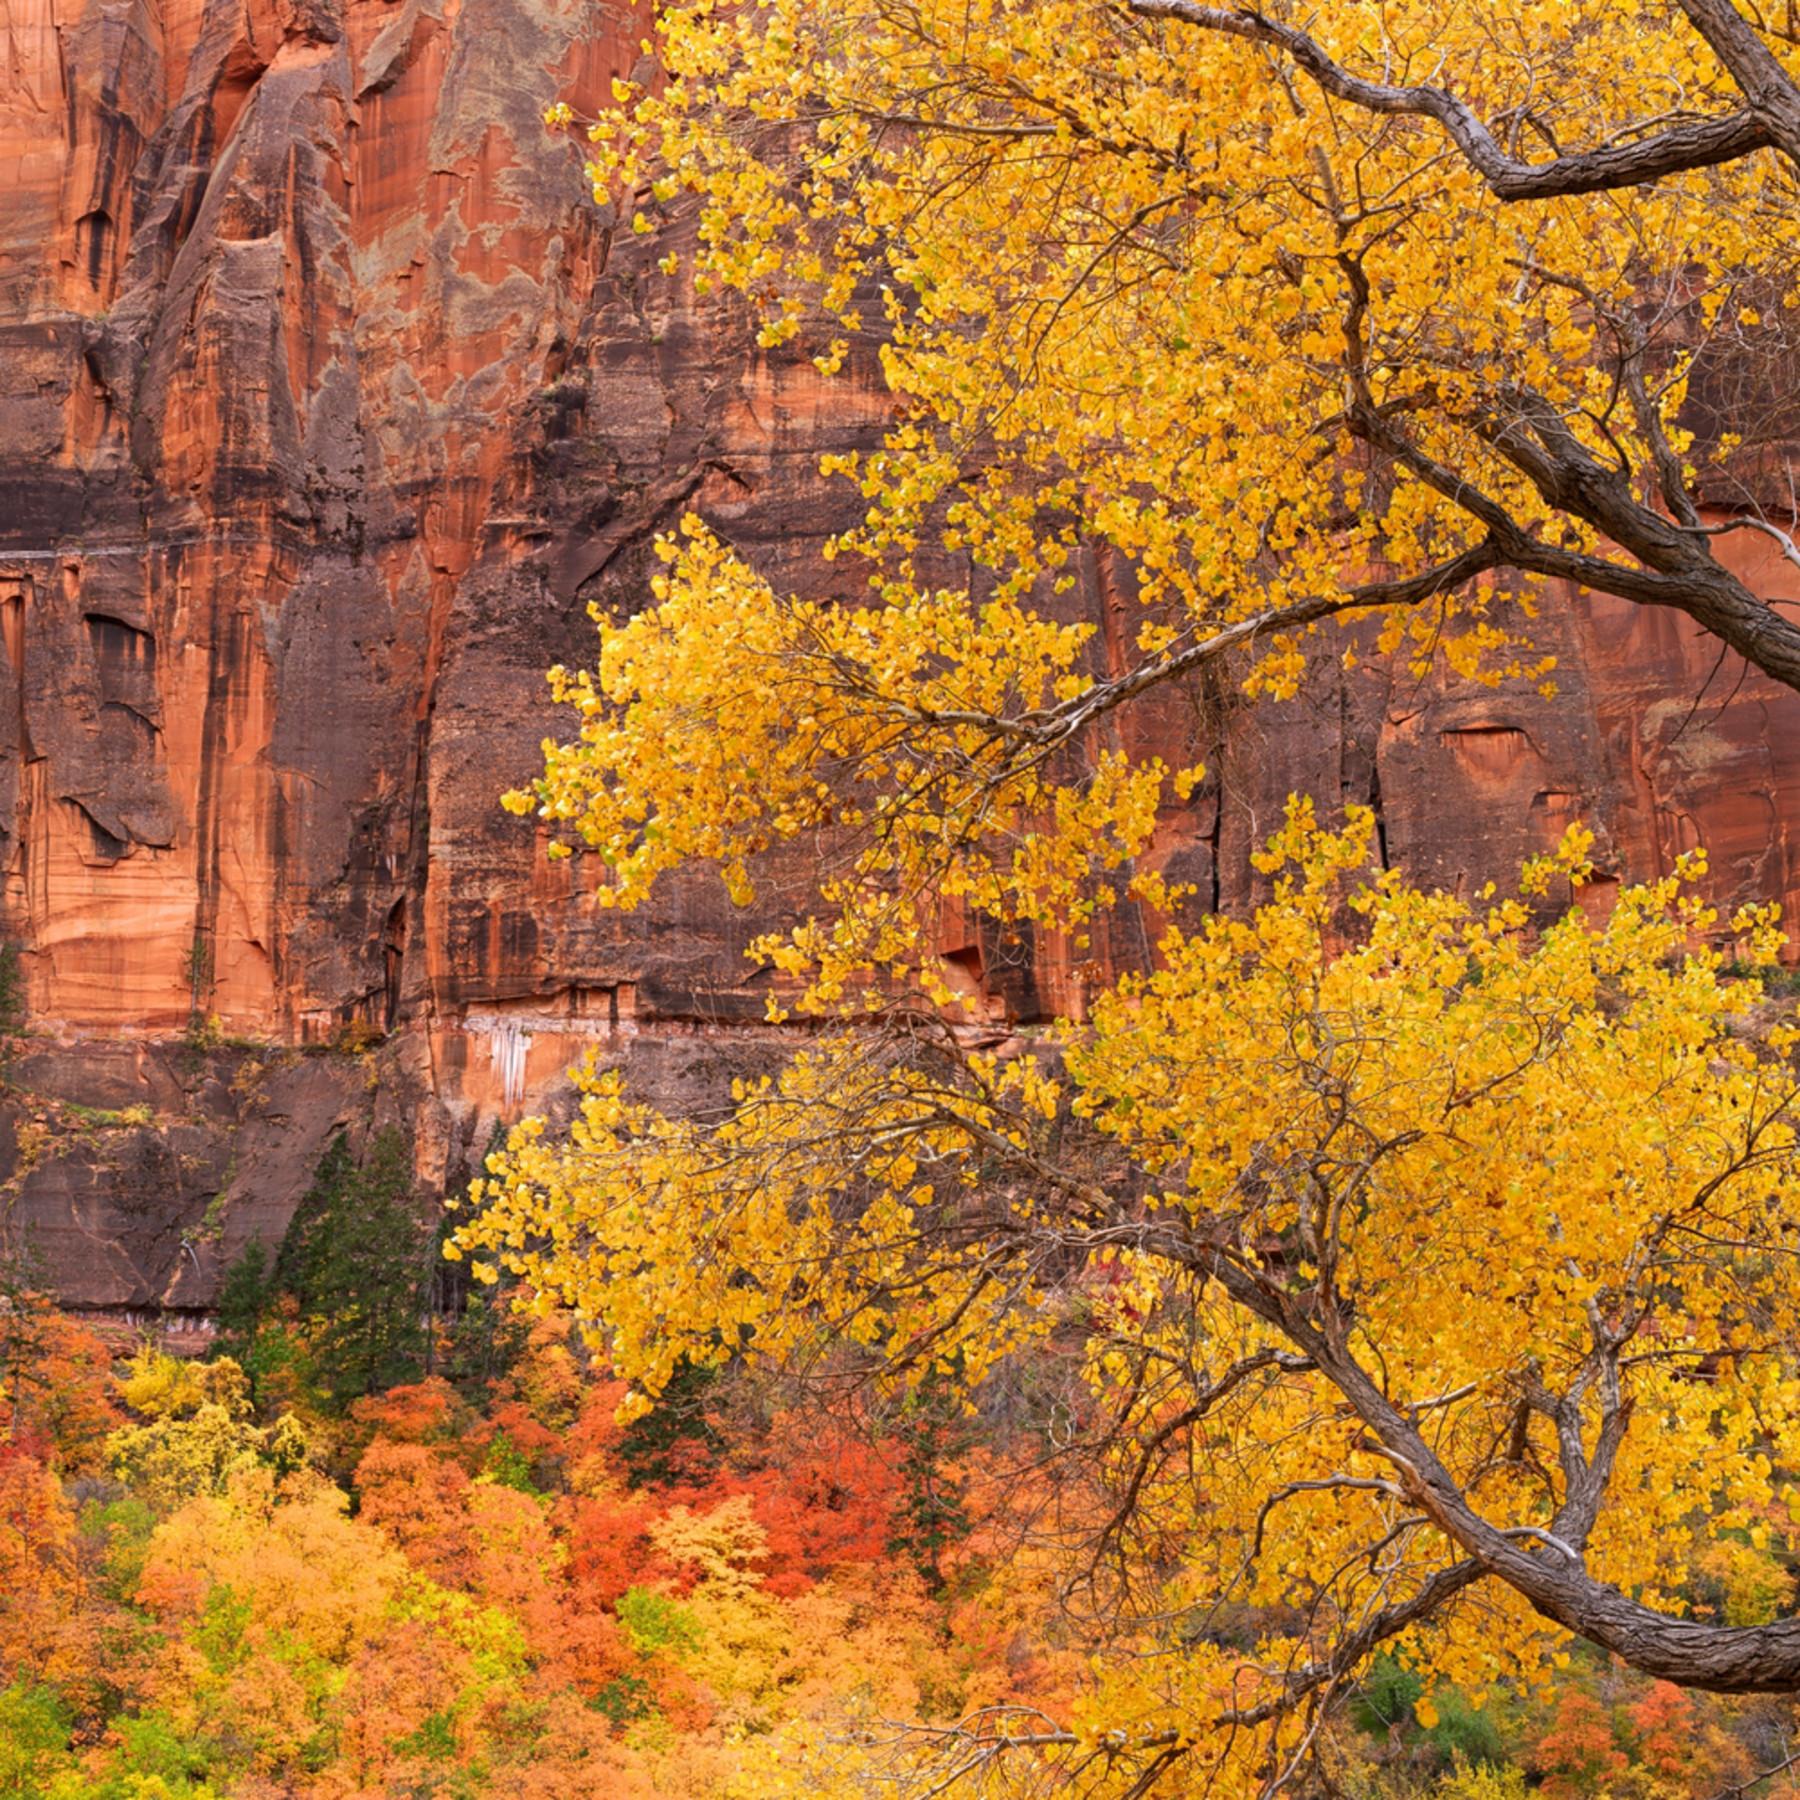 Canyon autumn juhuqc